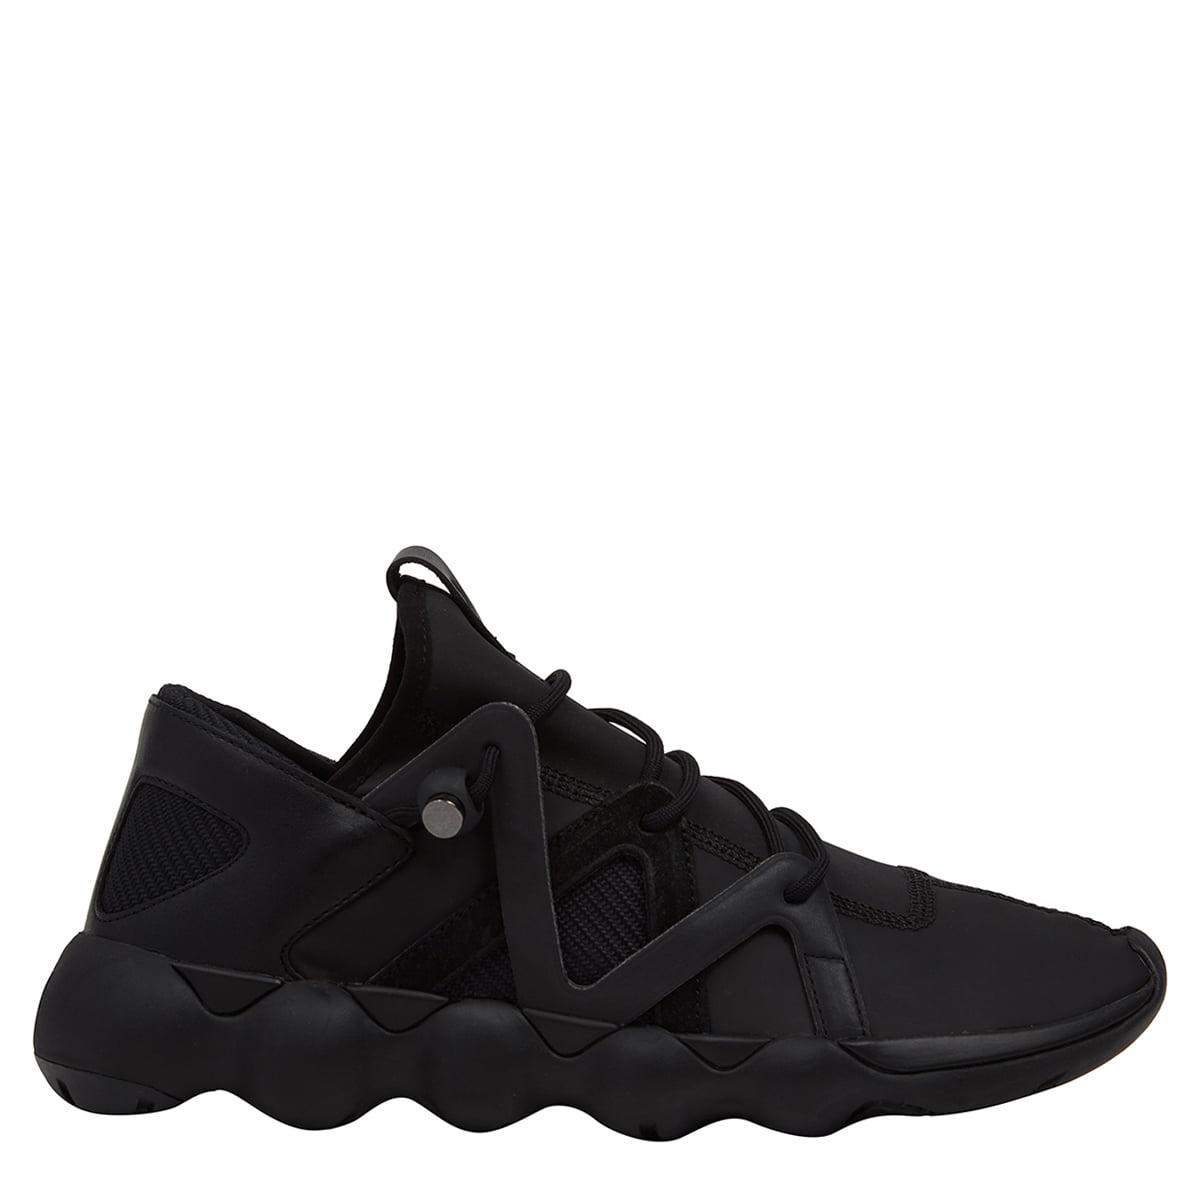 Adidas Y-3 Men's Kyujo Low Top Sneakers BB4736 SZ UK11/US...